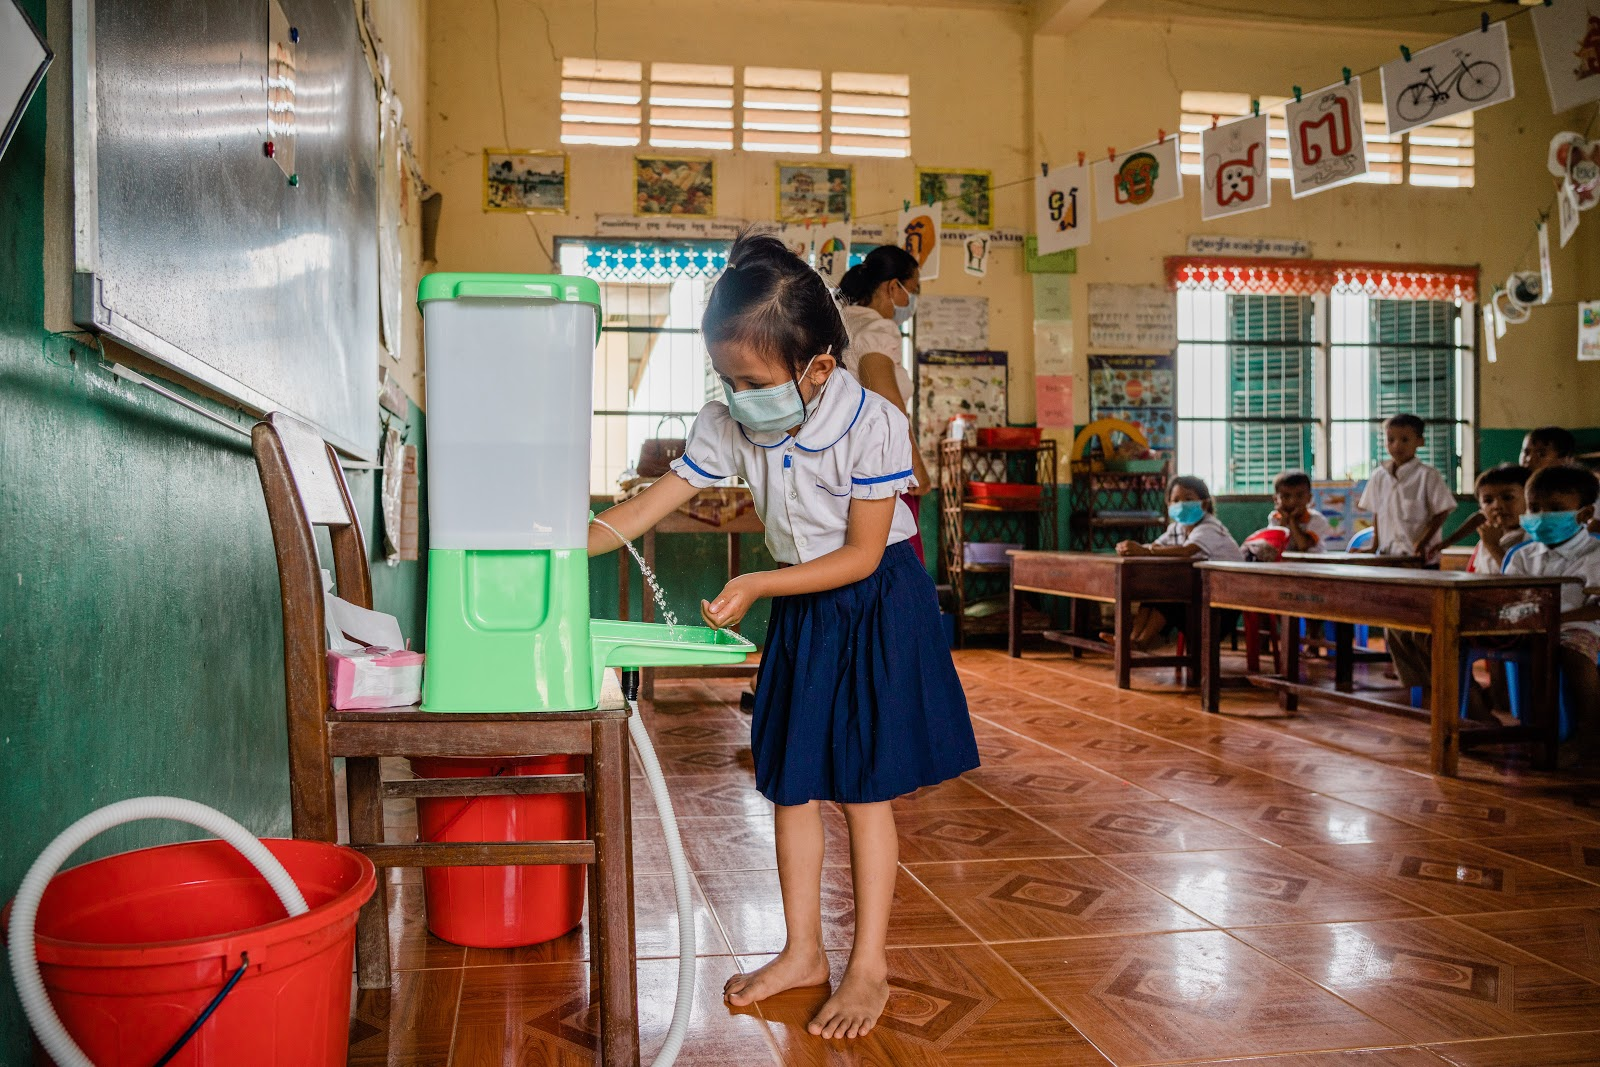 COVID-19 WHO WASH Technical Brief (WHO, UNICEF)